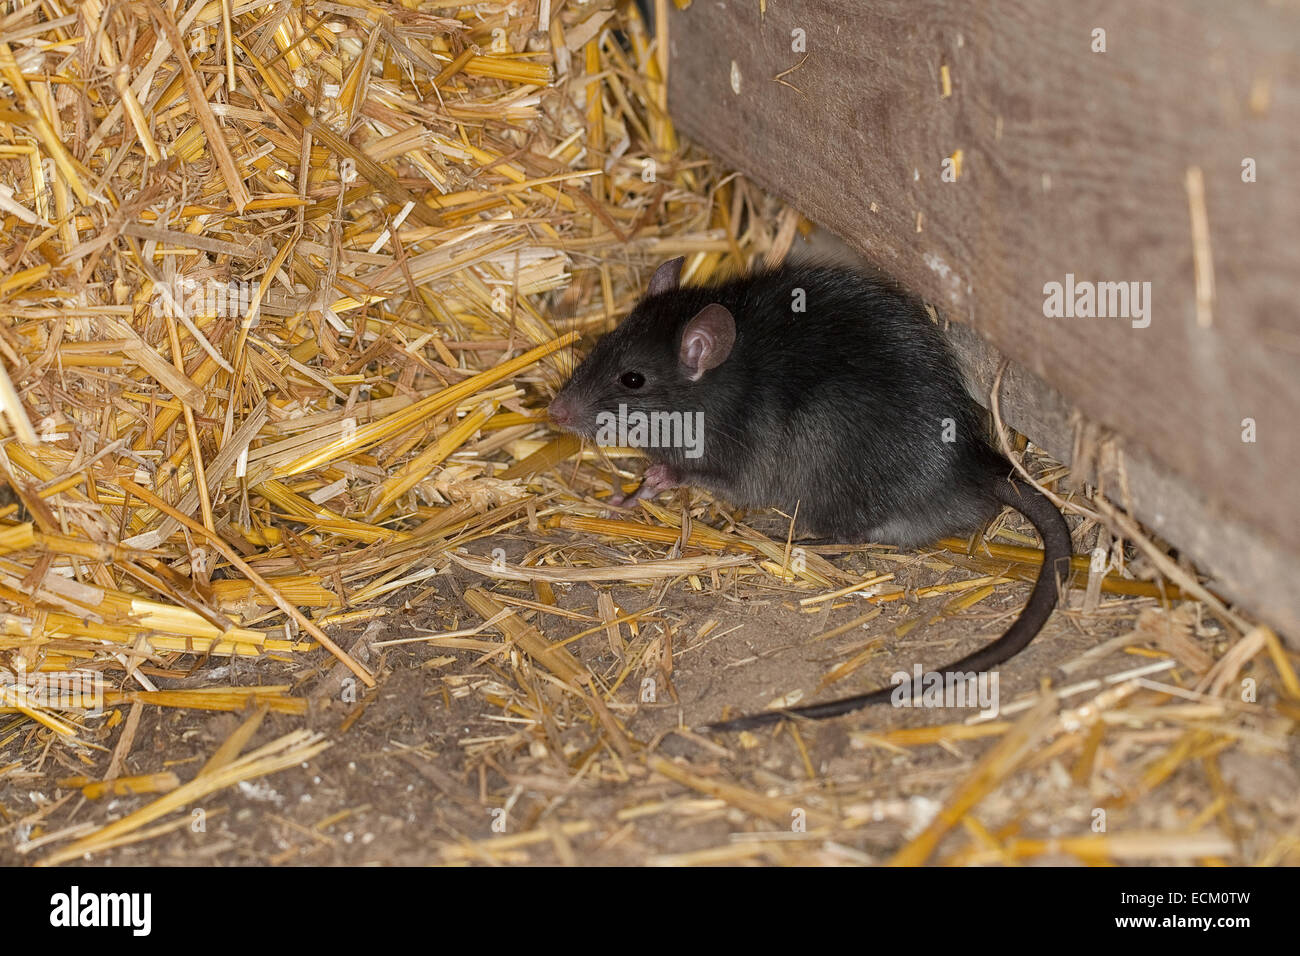 Schwarze Ratte, Dach-Ratte, Haus-Ratte, Schiff Ratte, Ratten, Hausratte, Haus-Ratte, Ratten, Ratte Rattus Rattus, Stockbild